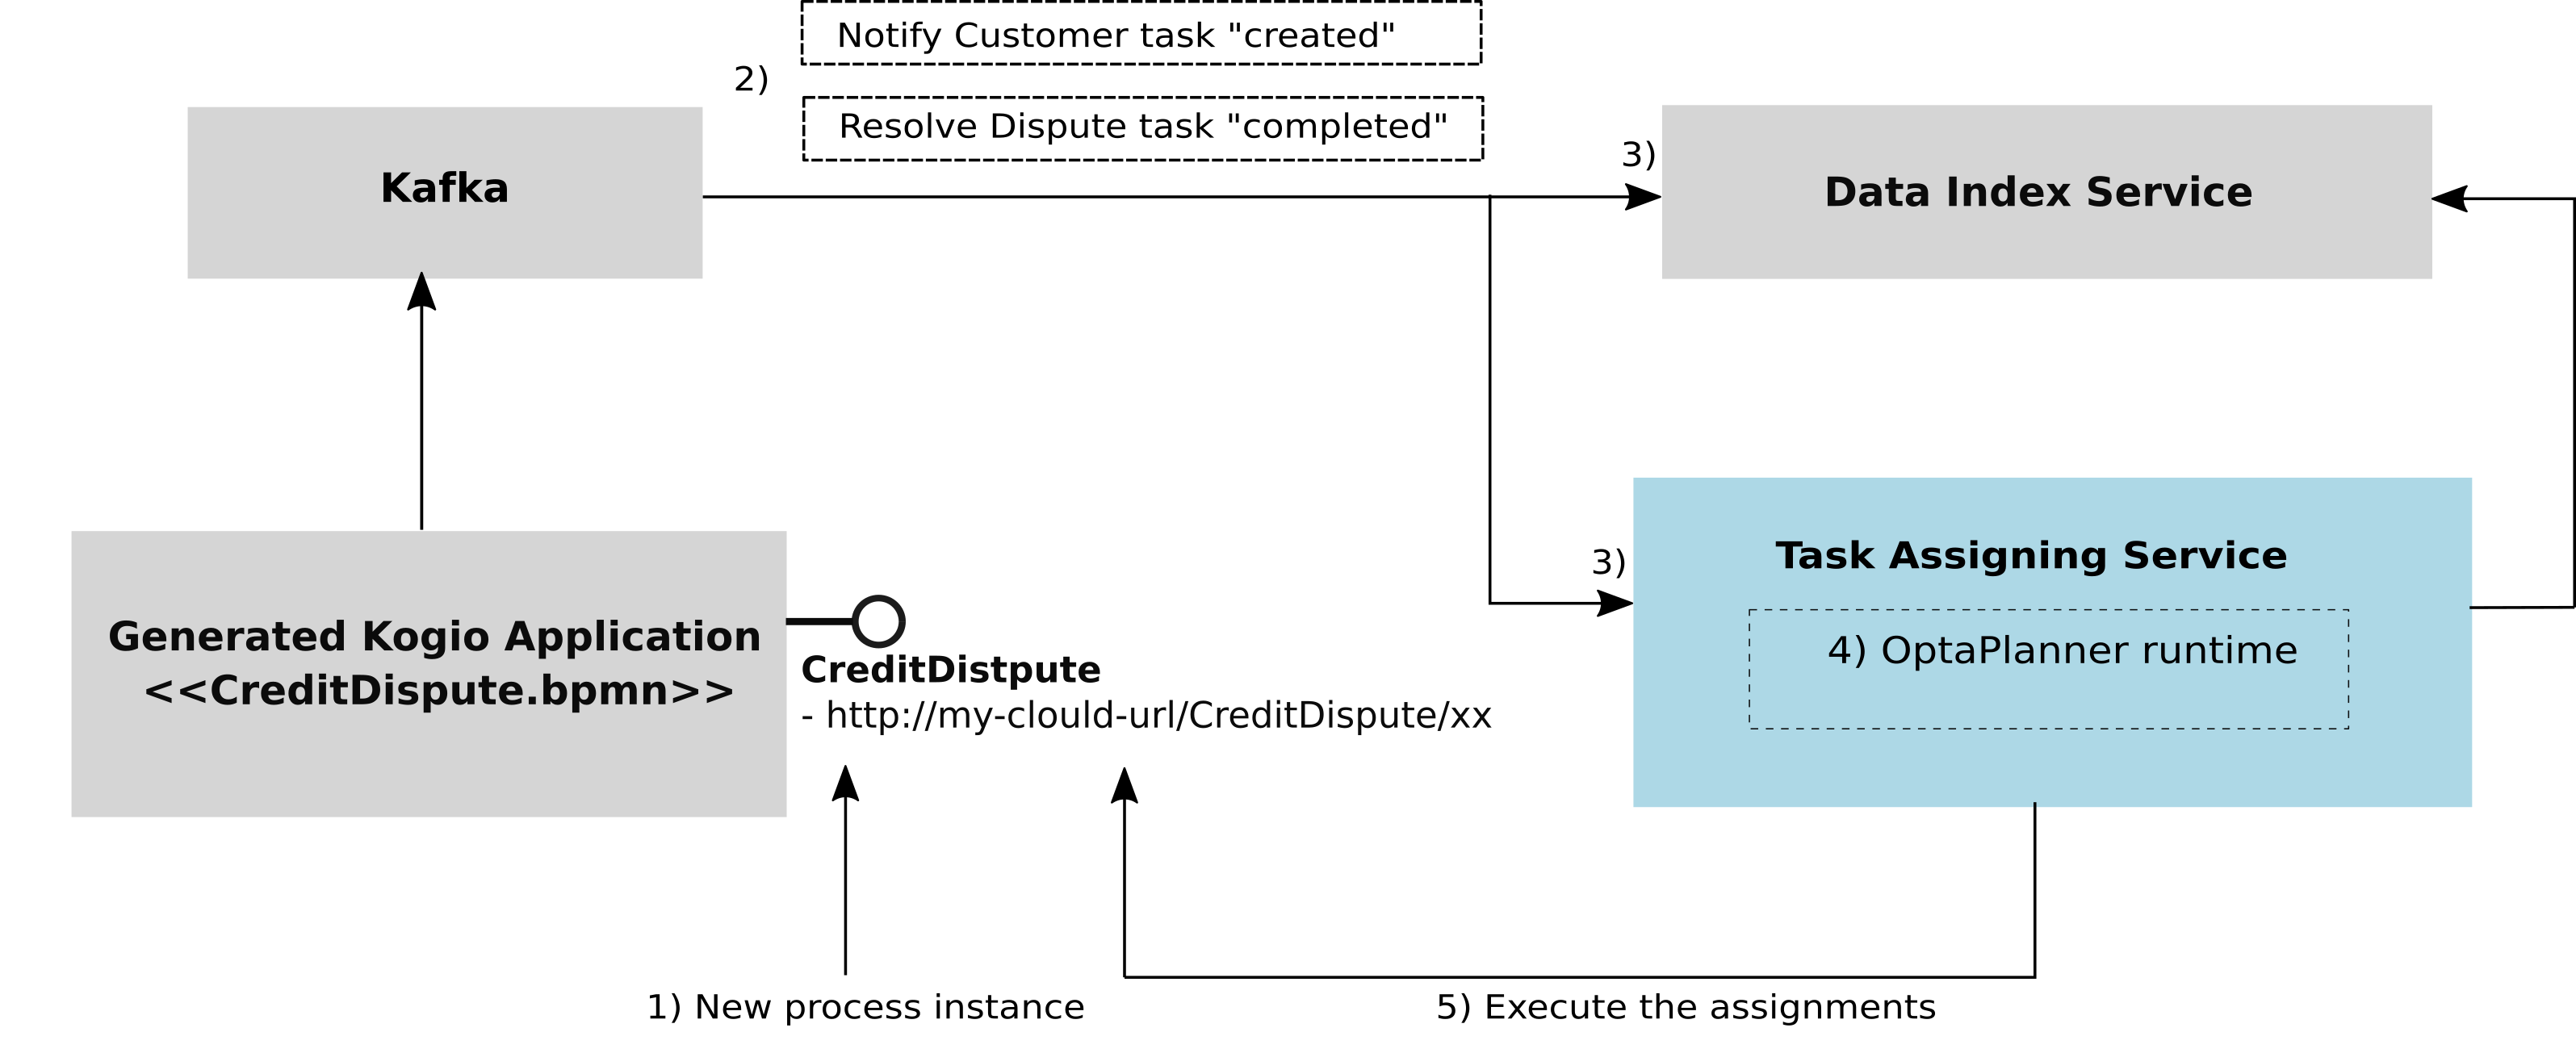 TaskAssigningServiceArchitecture